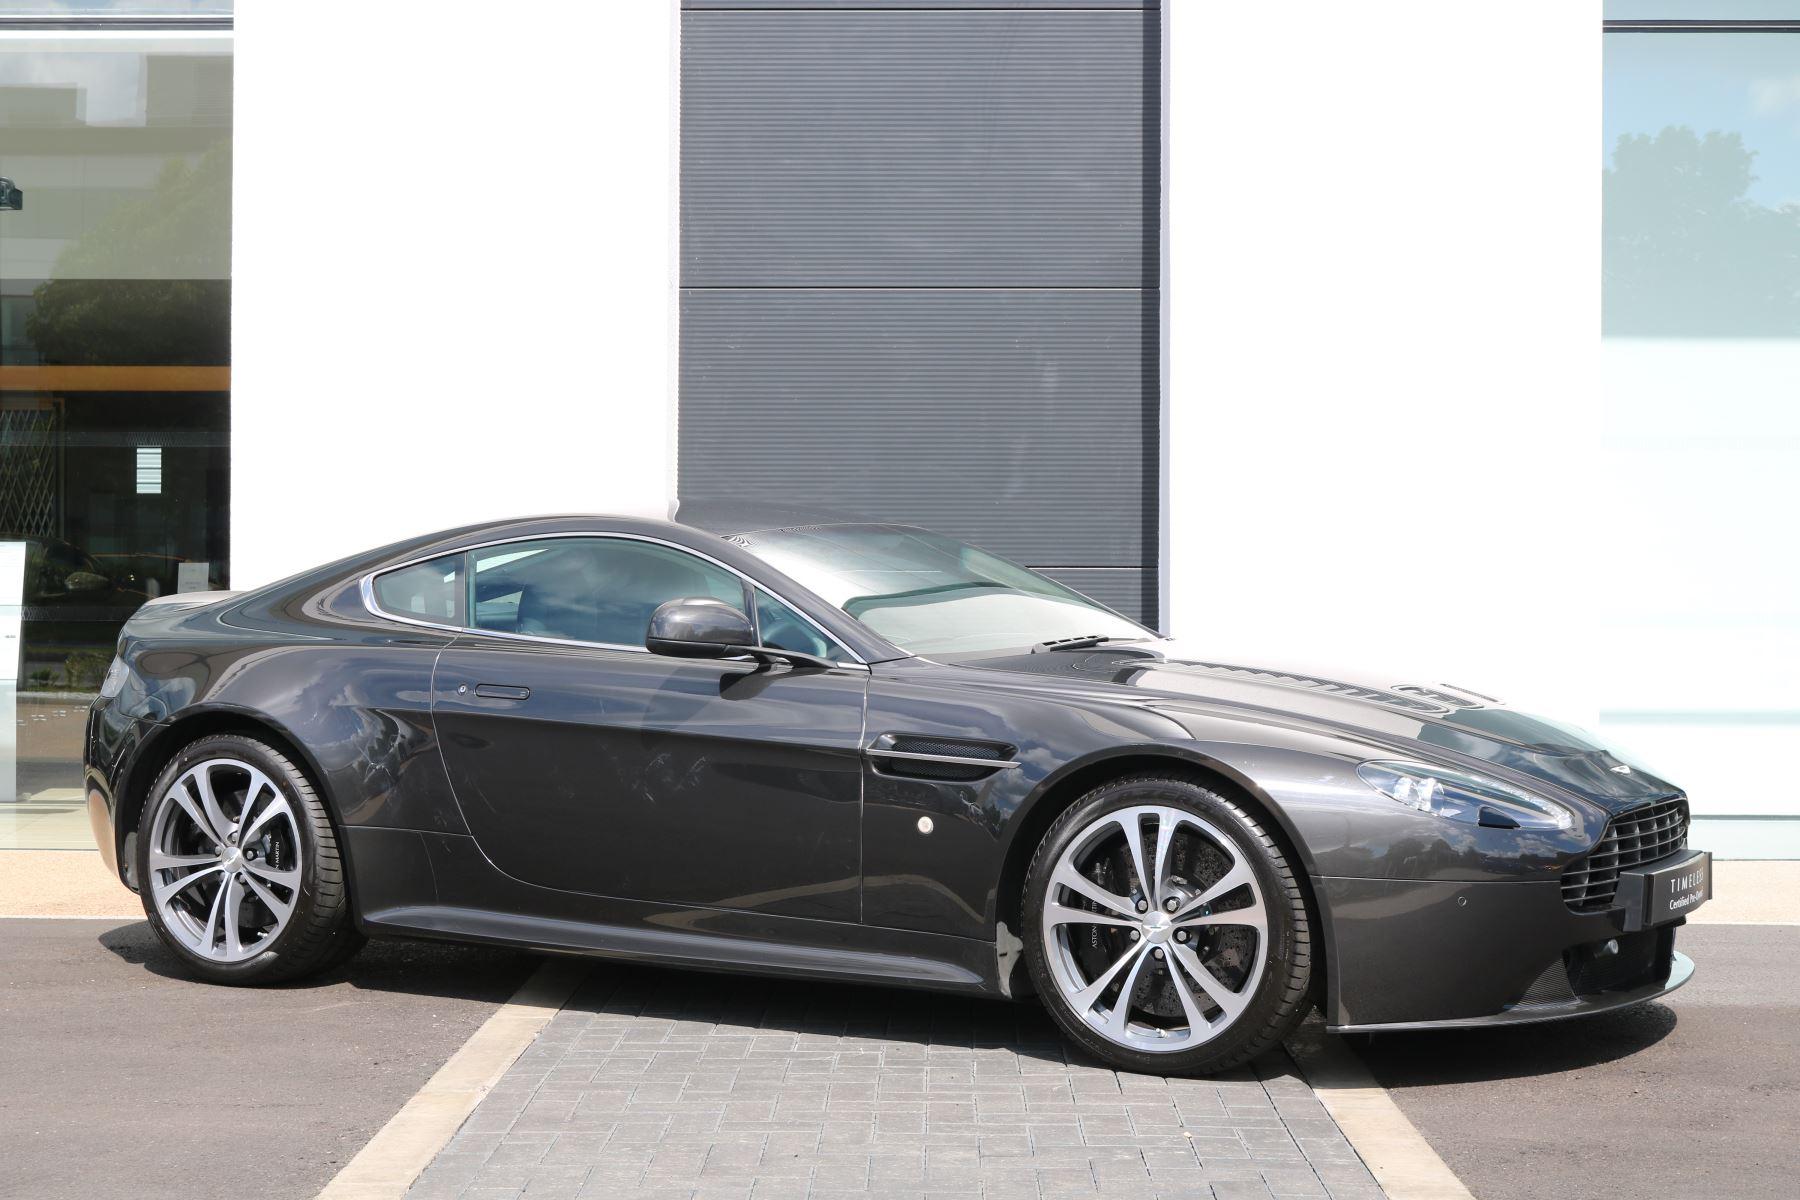 Aston Martin V12 Vantage 2dr image 8